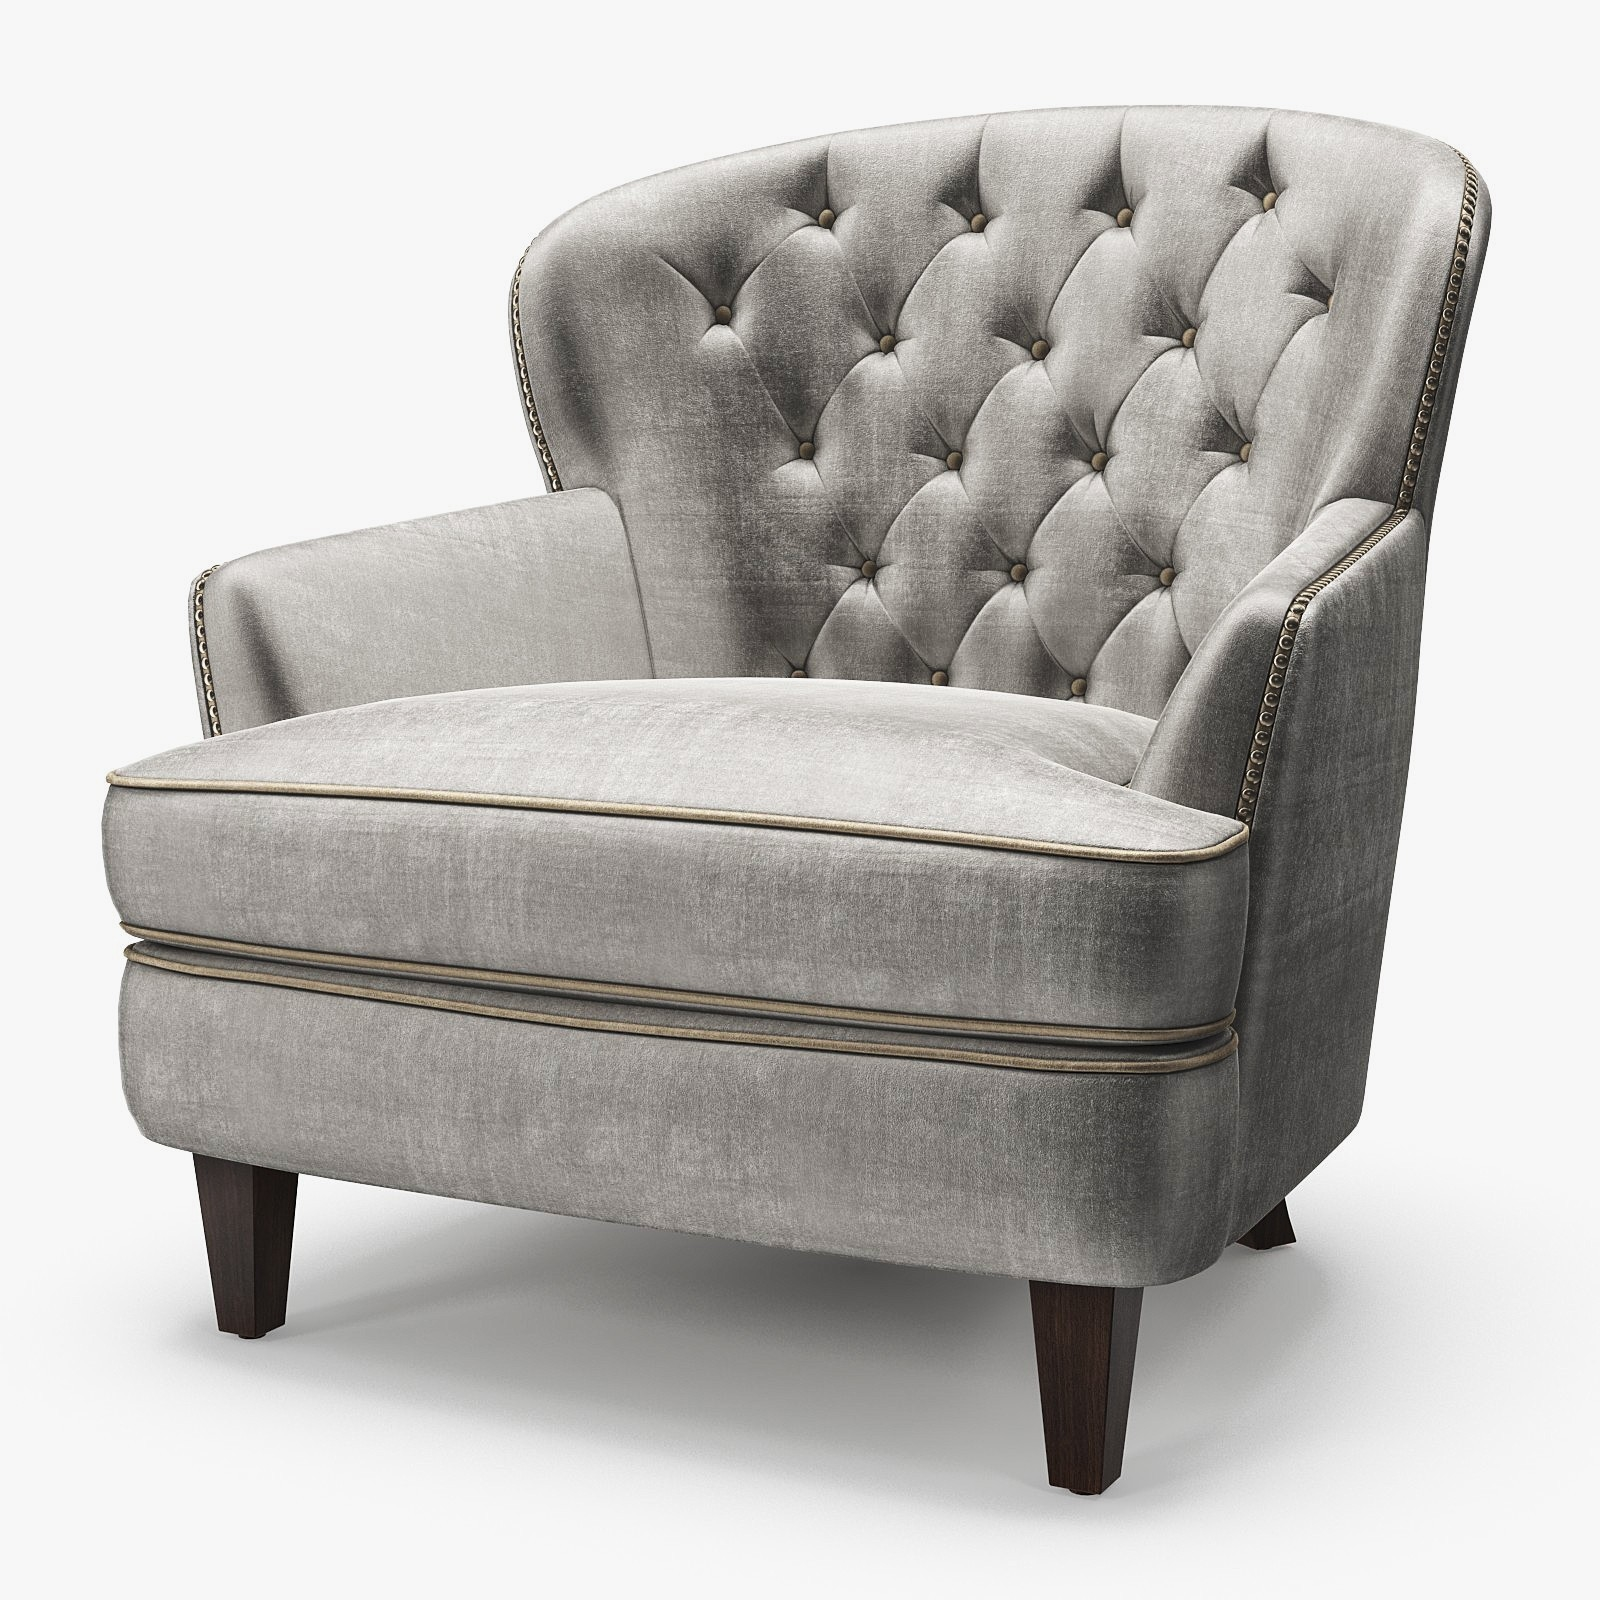 Blanc divoire - Paula armchair